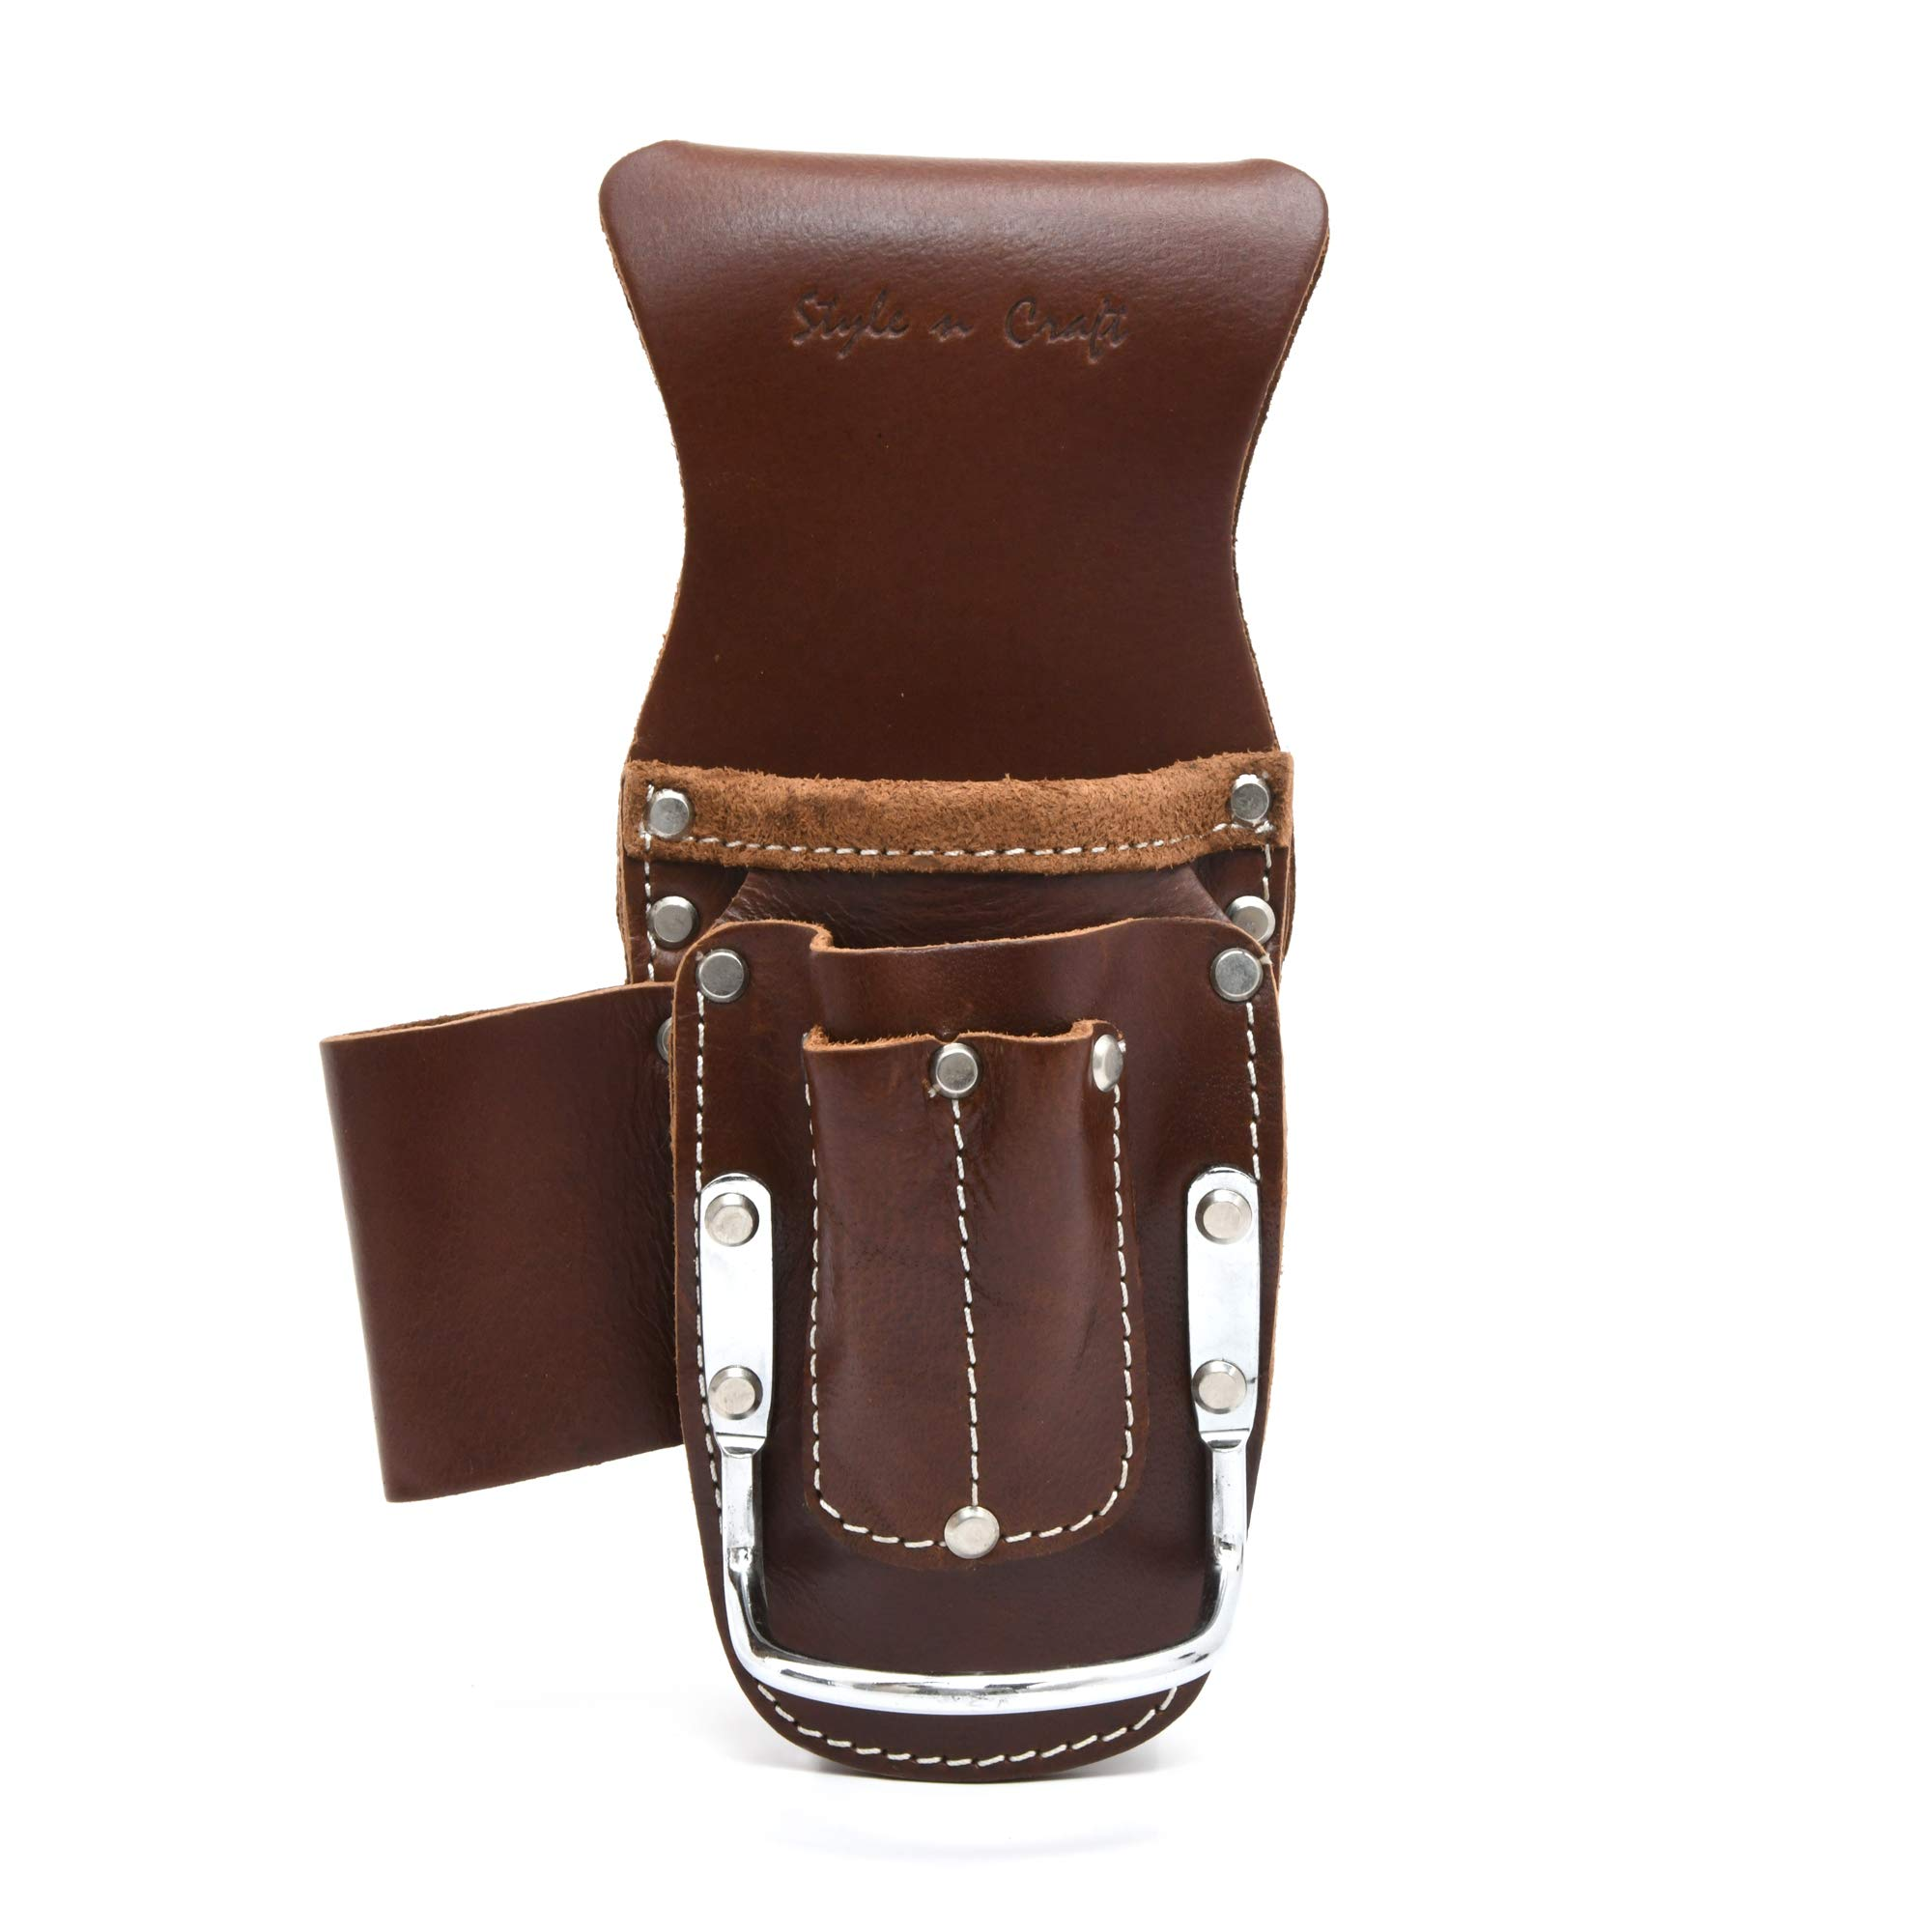 Style n Craft - 2 Pocket Pliers & Hammer Holder in Dark Tan Heavy Top Grain Leather #98016